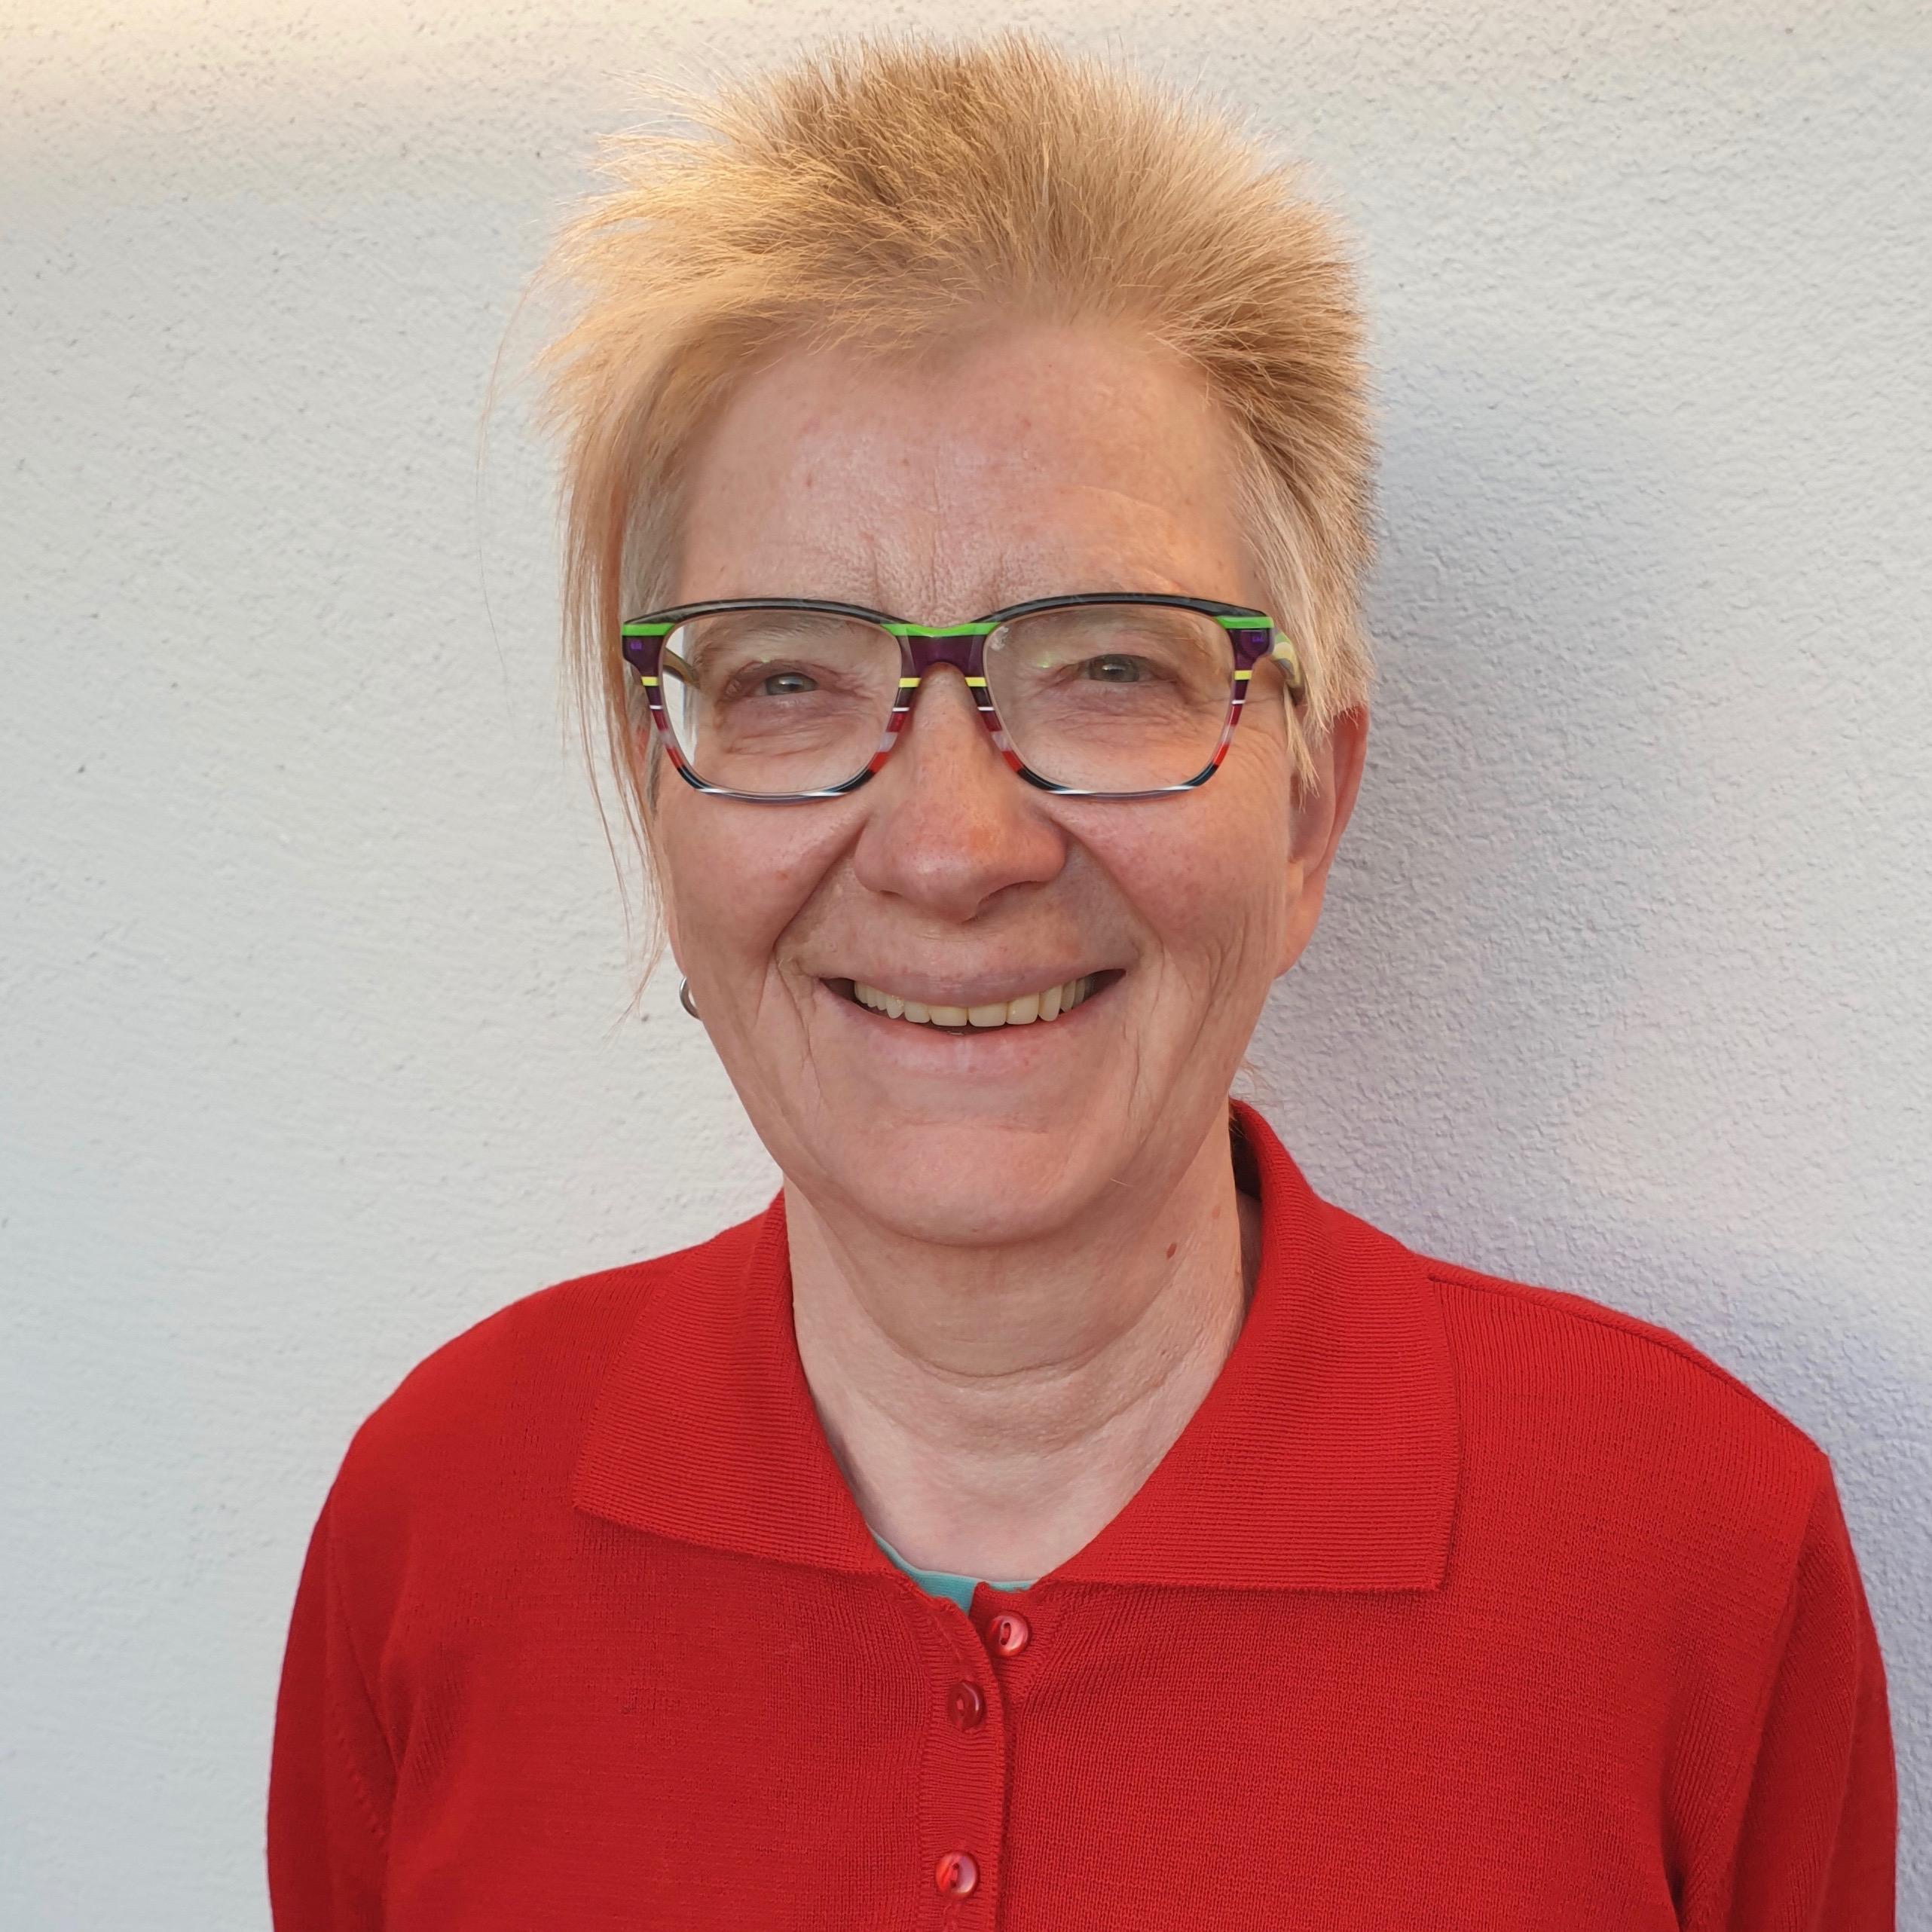 Doris Opitz-Köbernik